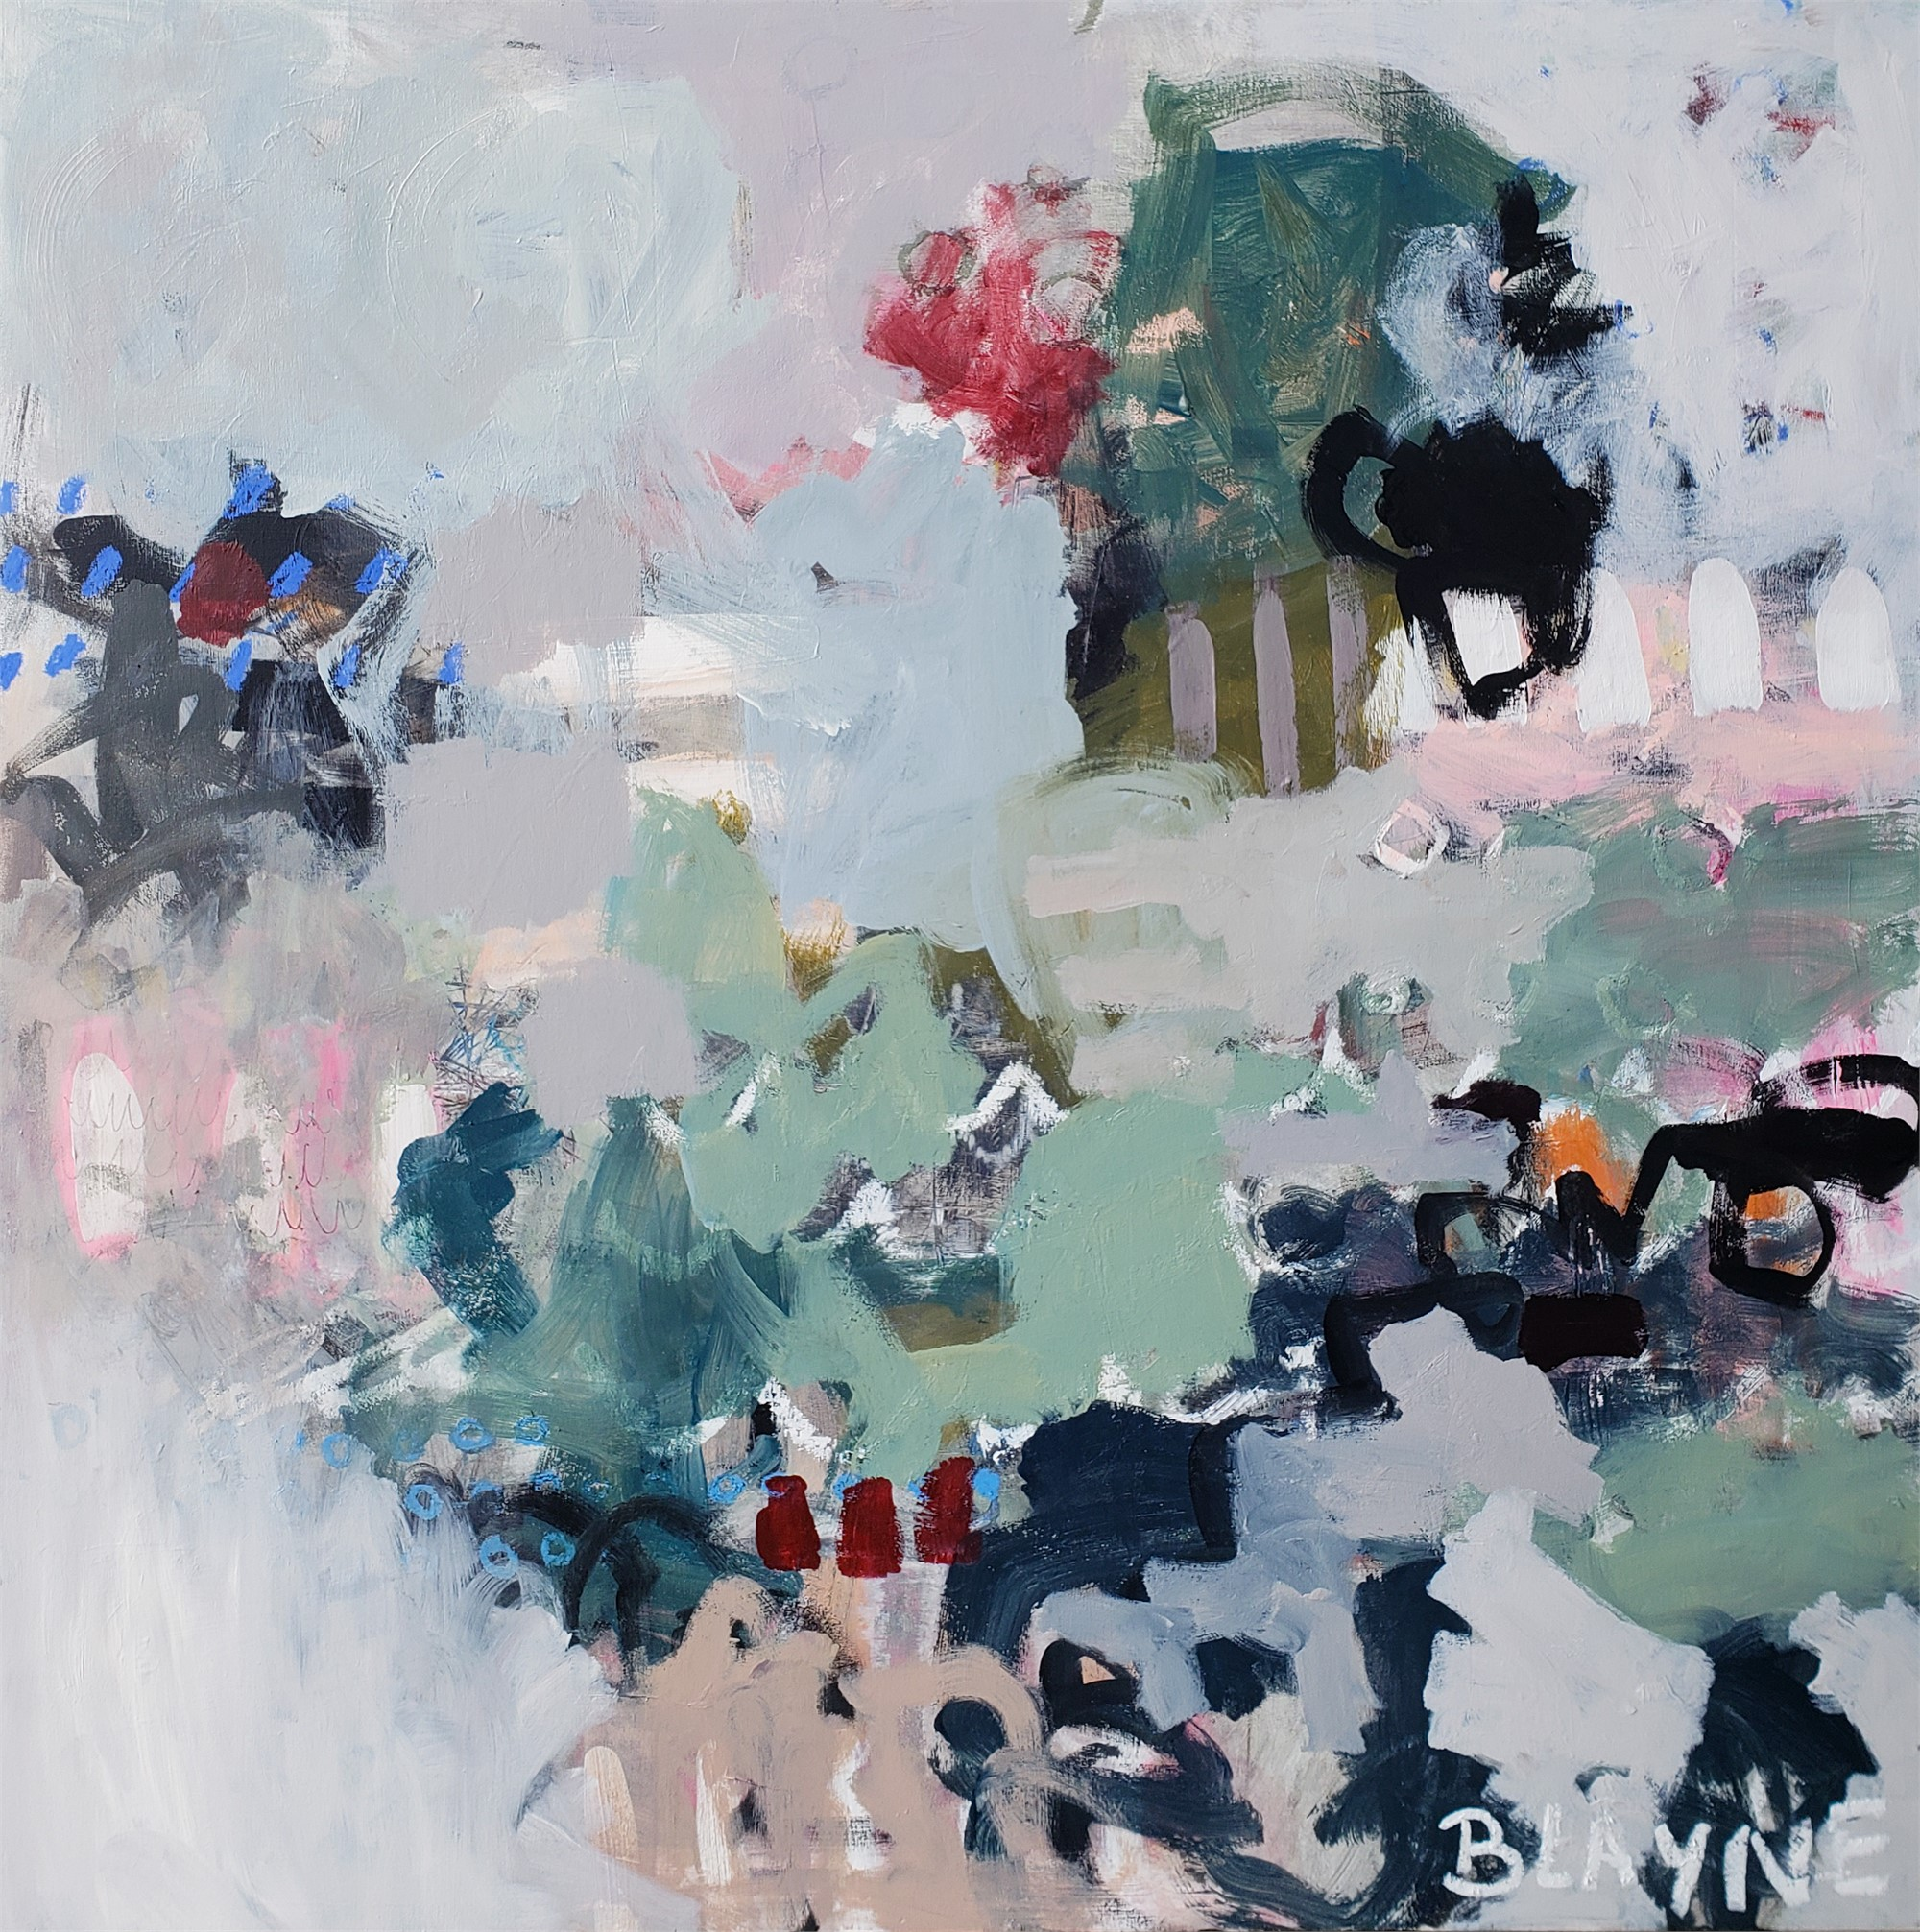 Wild and Free by Blayne Macauley